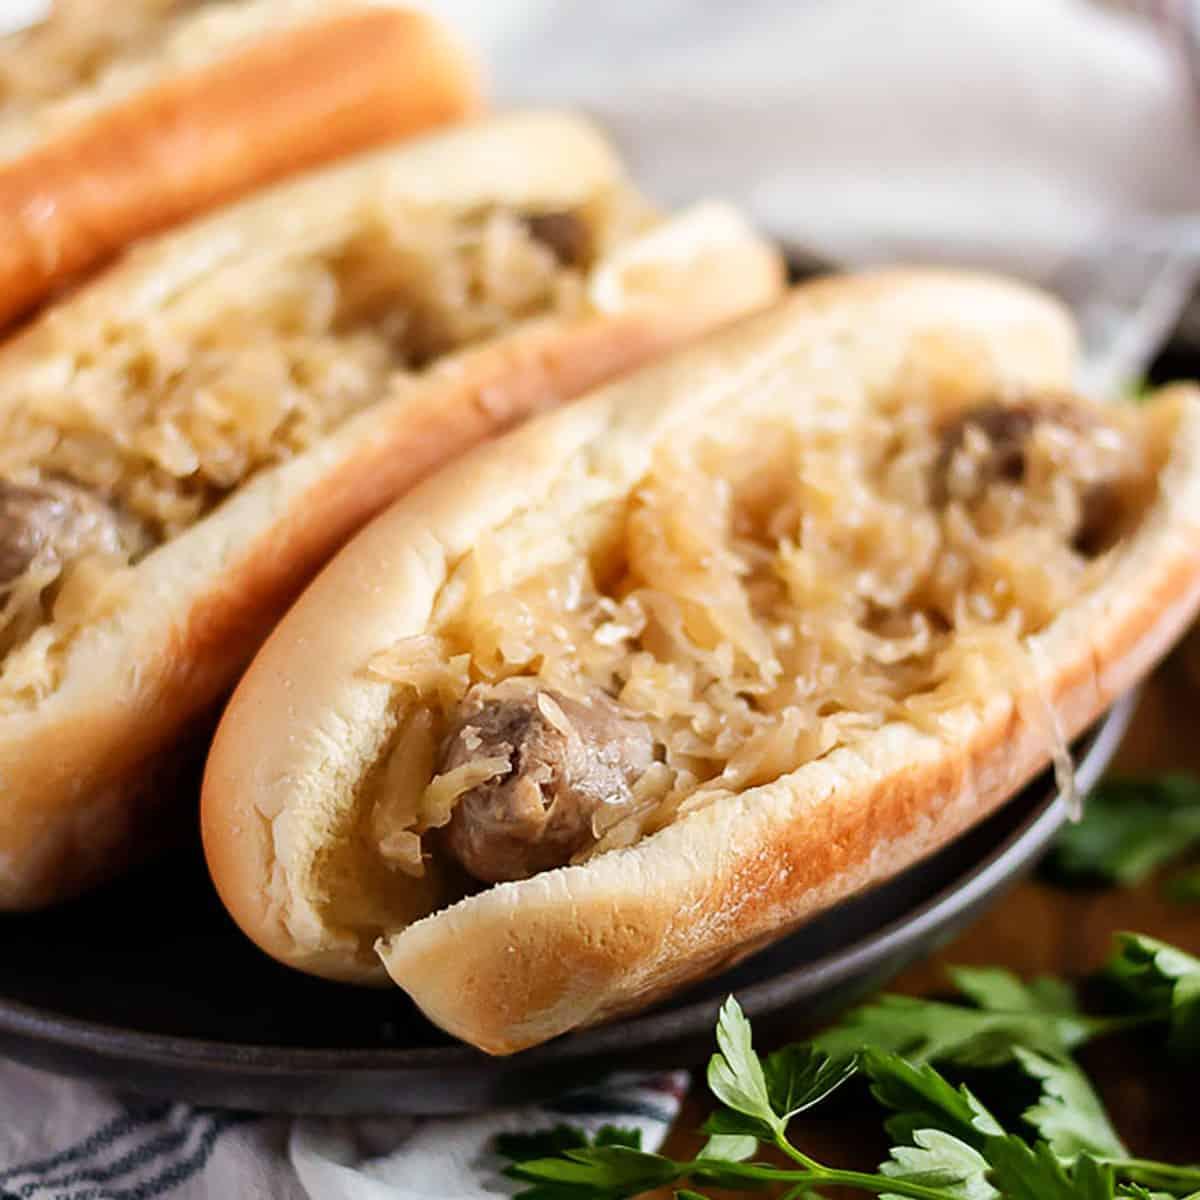 Bratwurst and sauerkraut in a hot do bun.